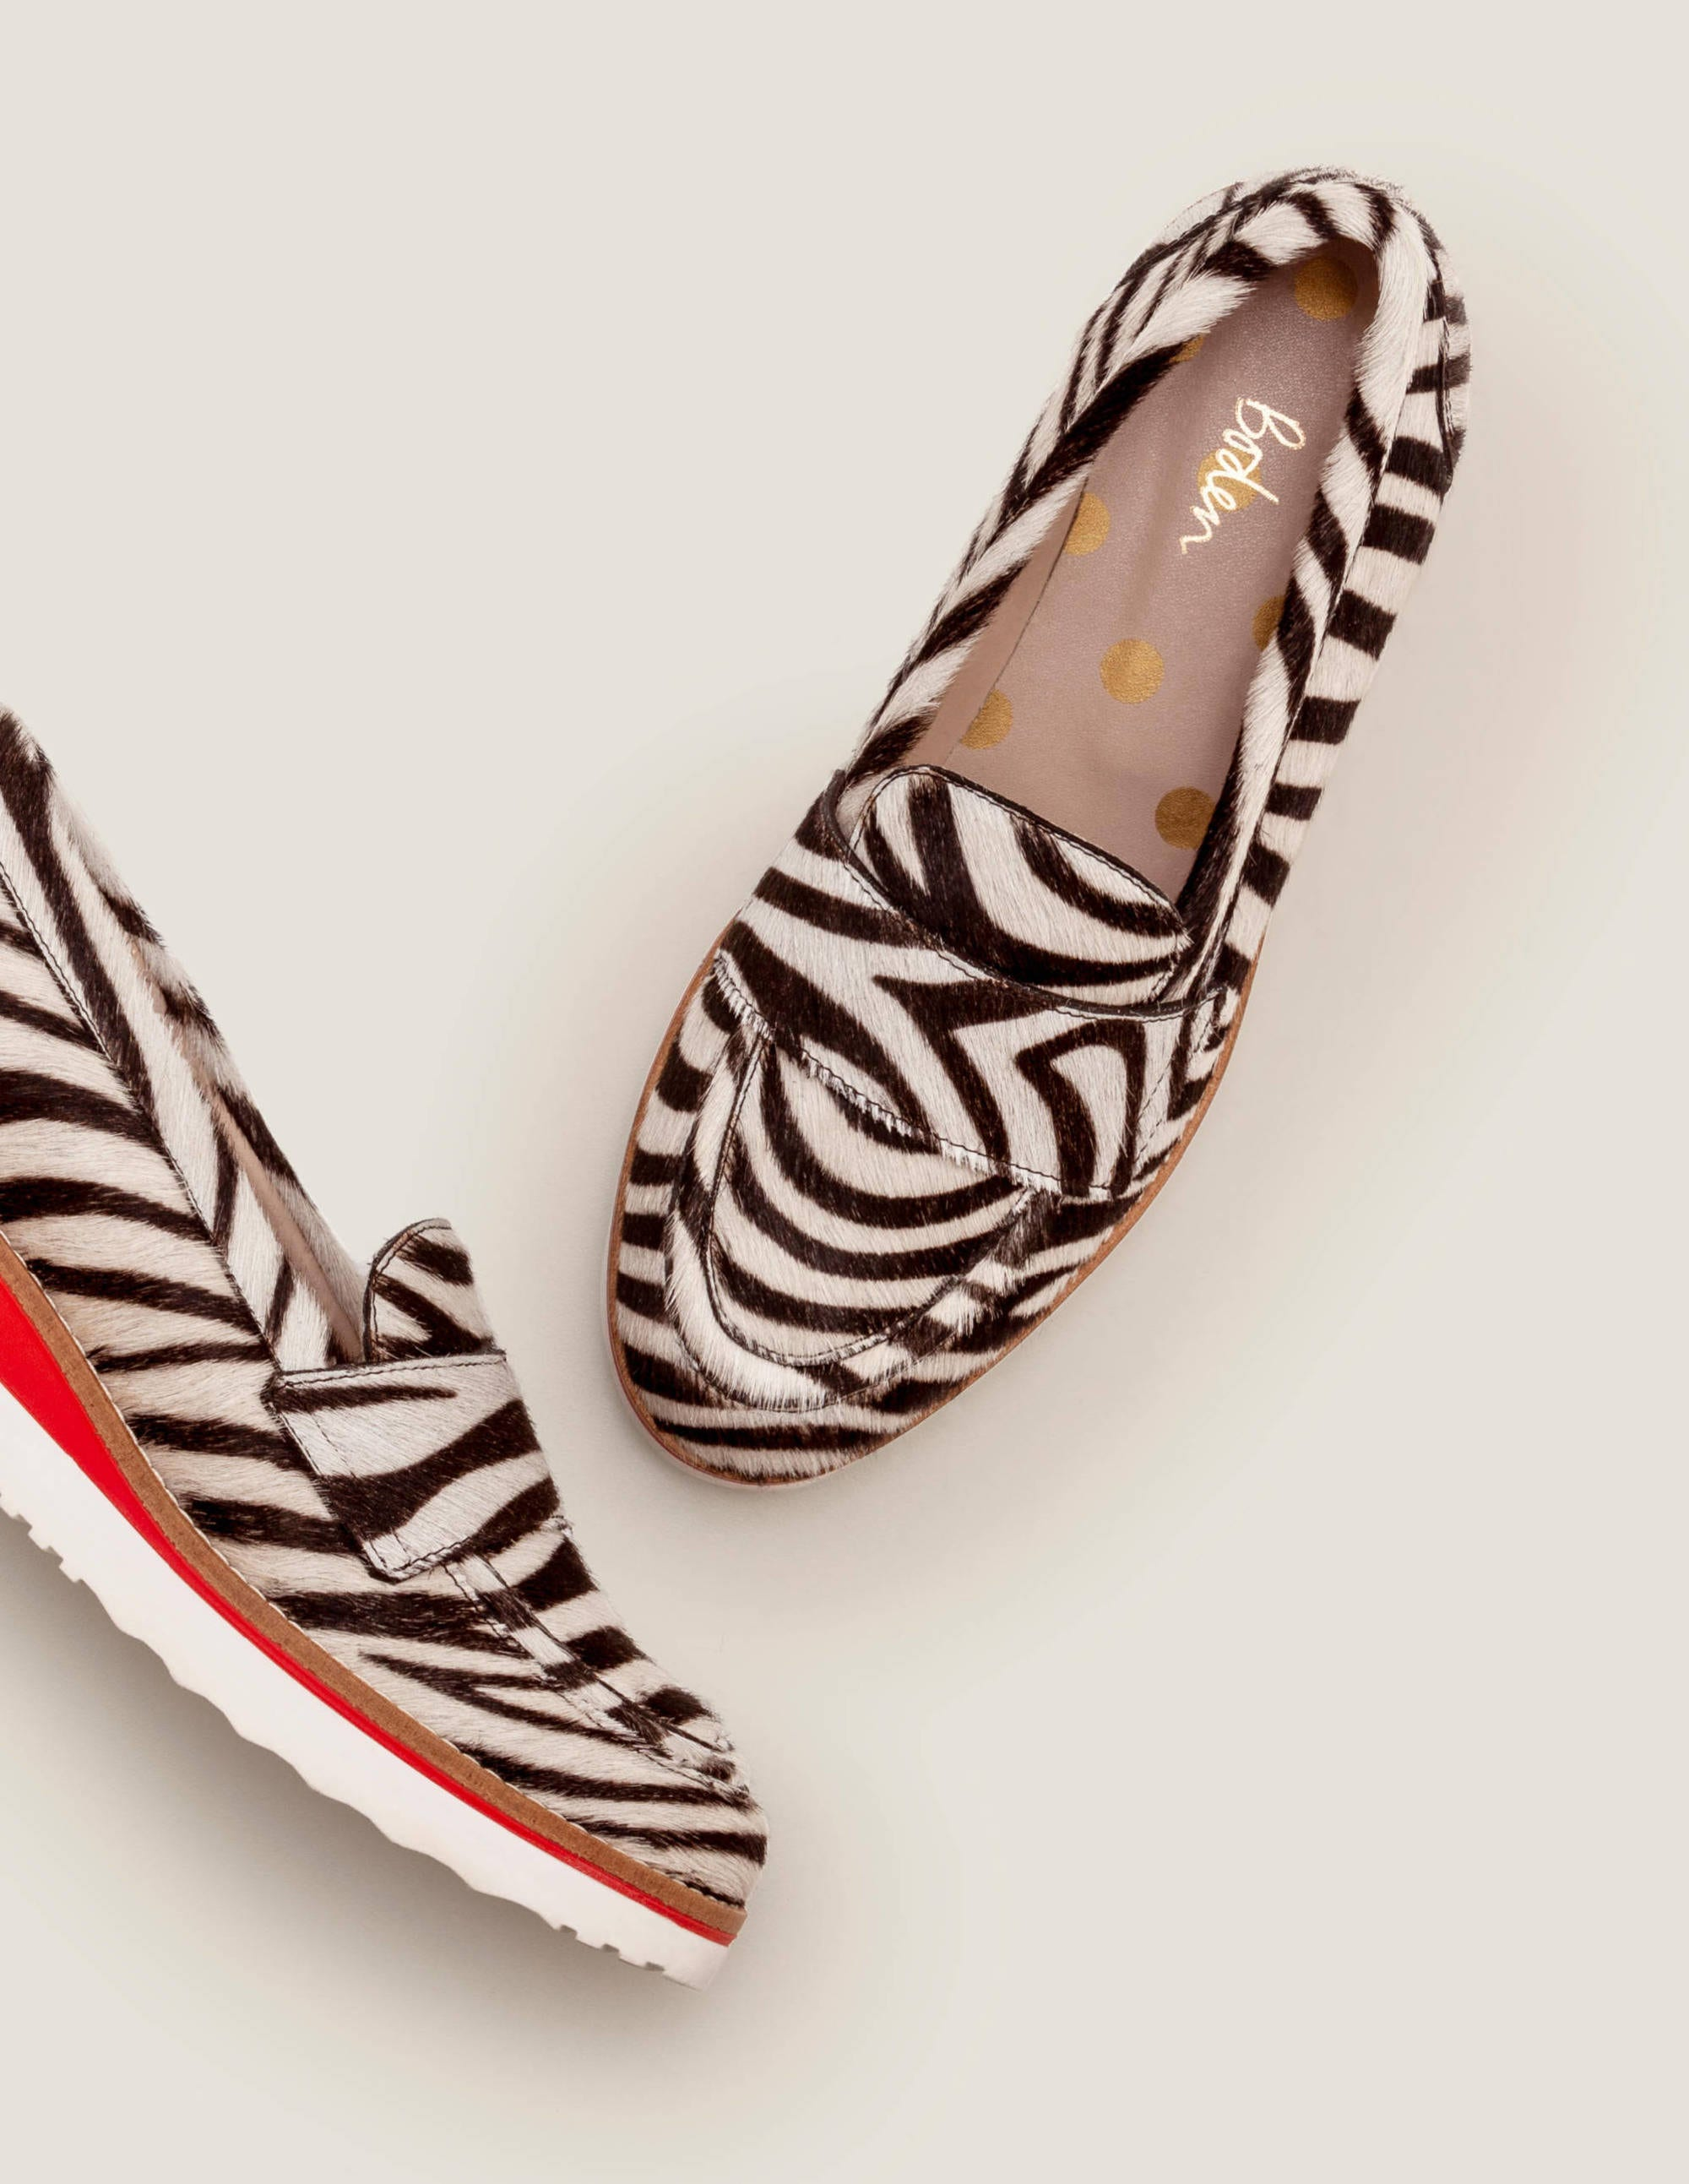 Boden girls GORGEOUS Flats Shoes Leopard Ponyskin Leather EU 36 UK 3 Brand new.